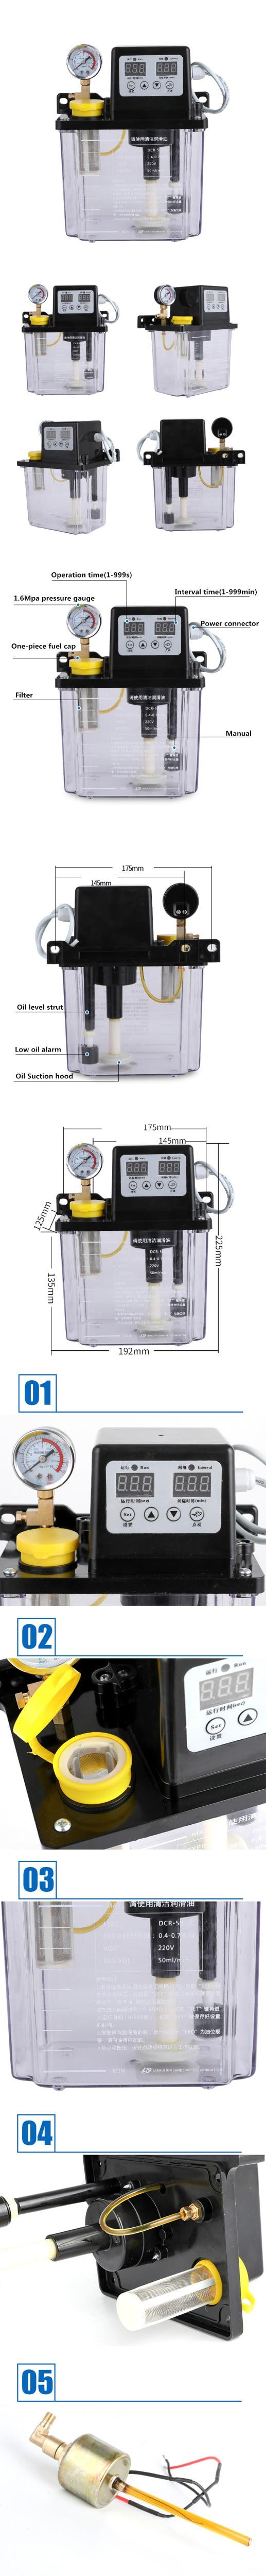 220 v bomba de óleo eletromagnética bomba